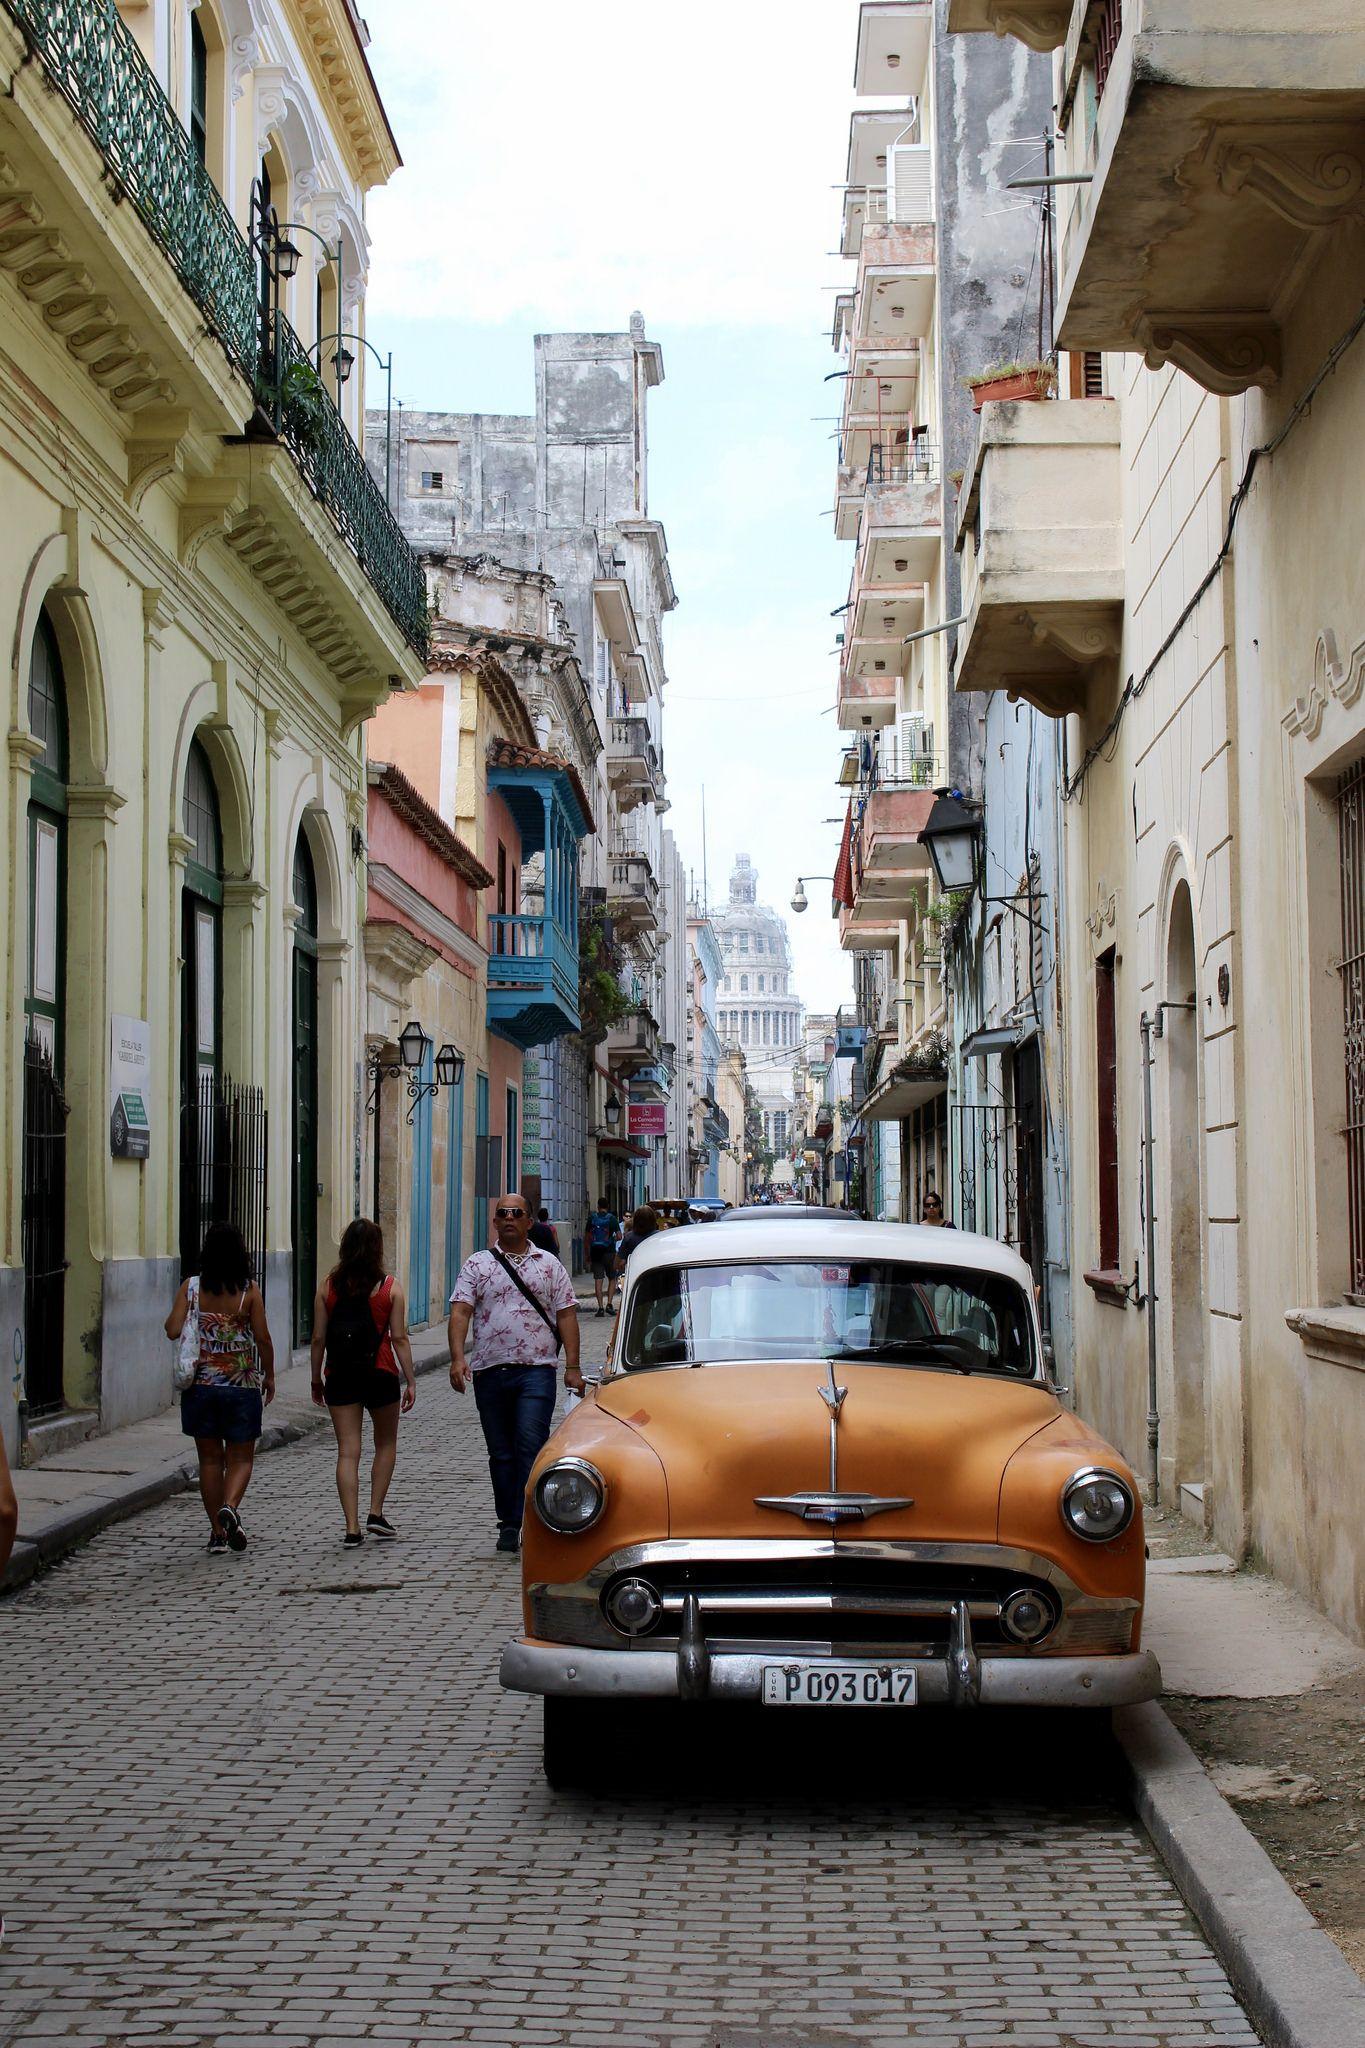 https://flic.kr/p/FnzX3K | La Habana, Cuba | Calle Brasil. La Habana Vieja